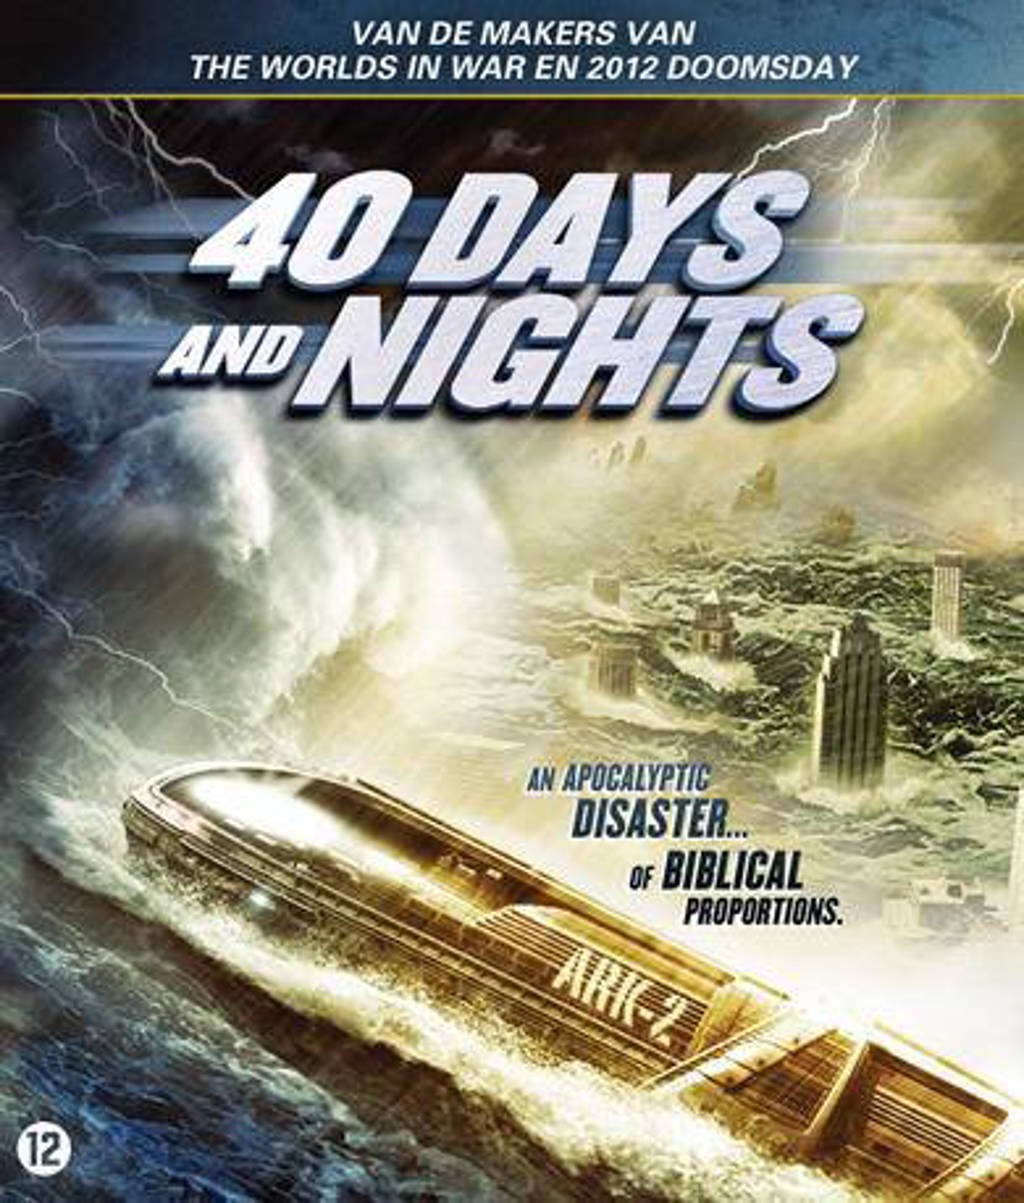 40 days and nights (Blu-ray)